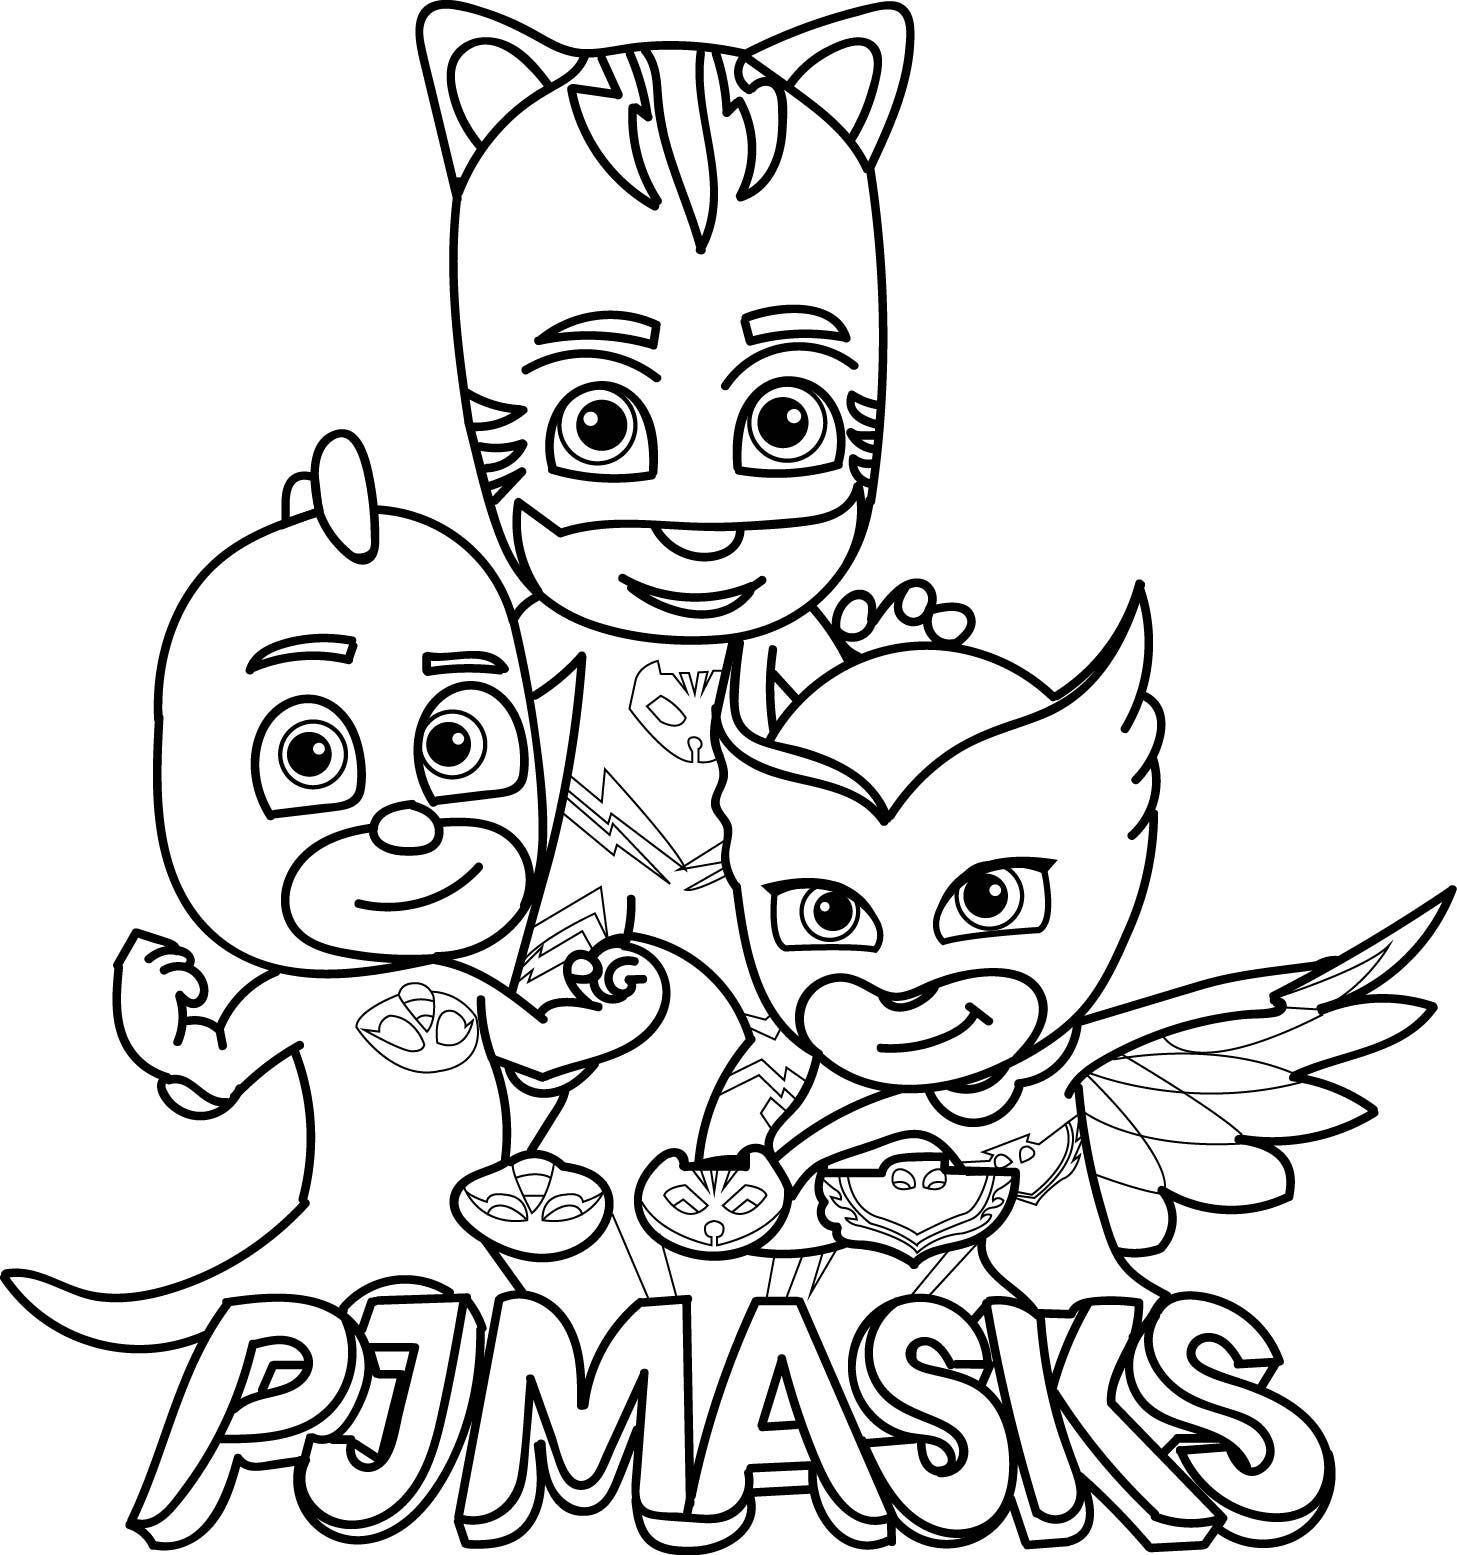 Pj Masks Coloring Pages, Pj Masks Printable, Coloring Pages